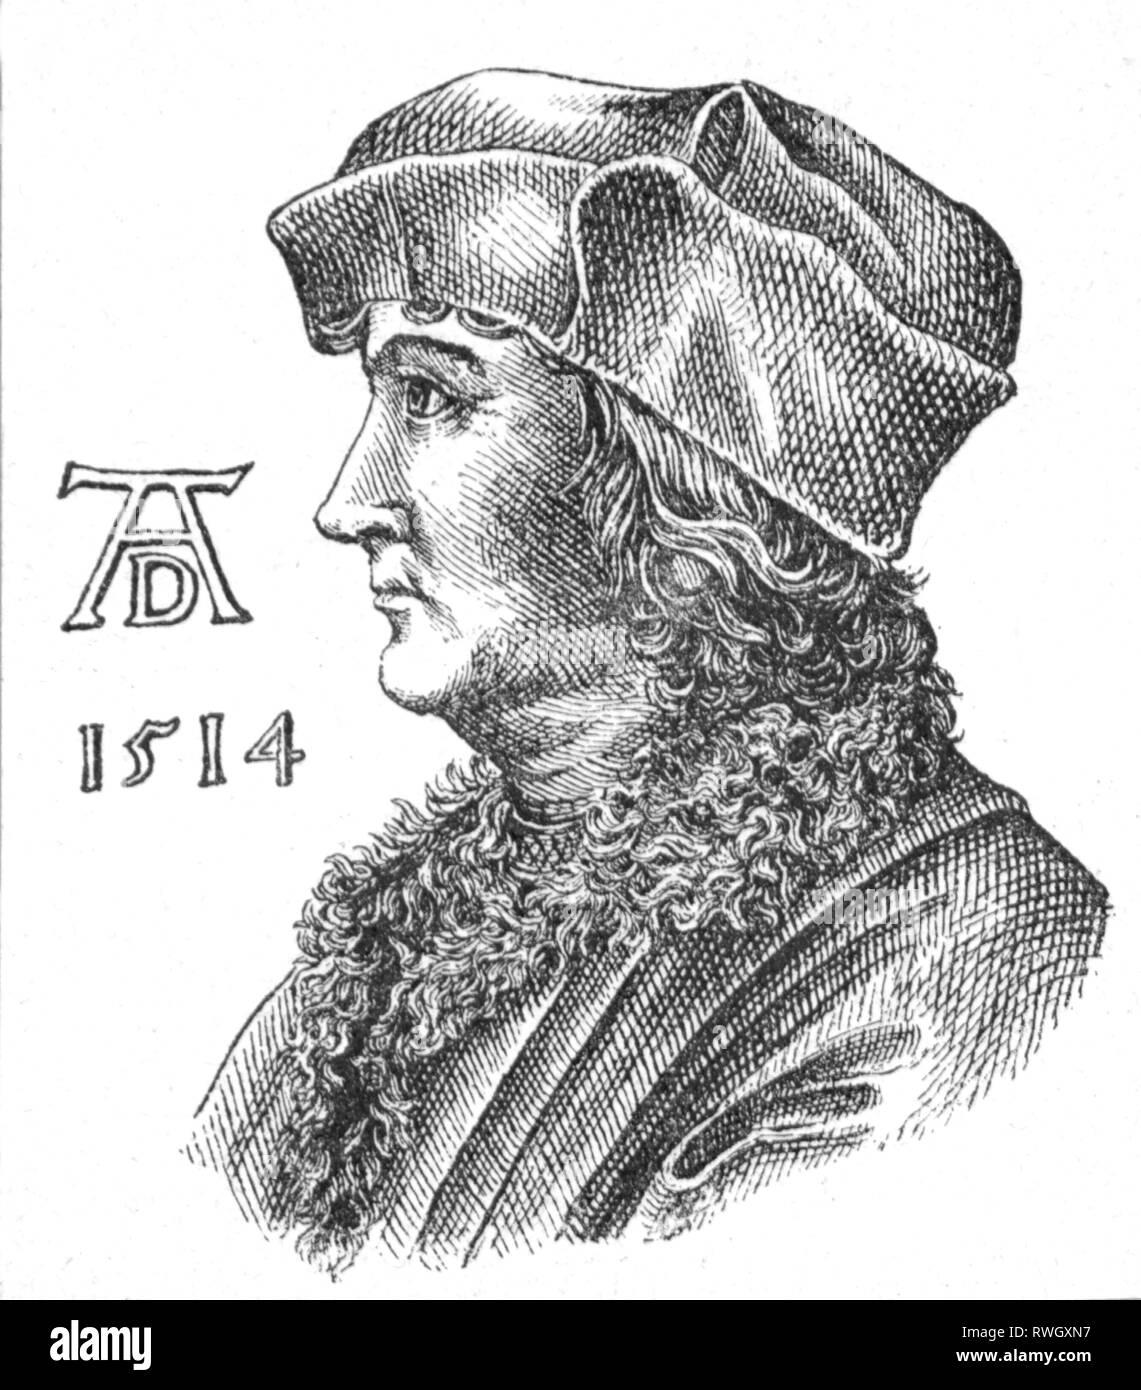 Dürer, Albrecht der Ältere, ca. 1427 - 1502, deutscher Goldschmied, Porträt, nach dem Kupferstich von Albrecht Dürer der Jüngere, 1514, Artist's Urheberrecht nicht geklärt zu werden. Stockbild